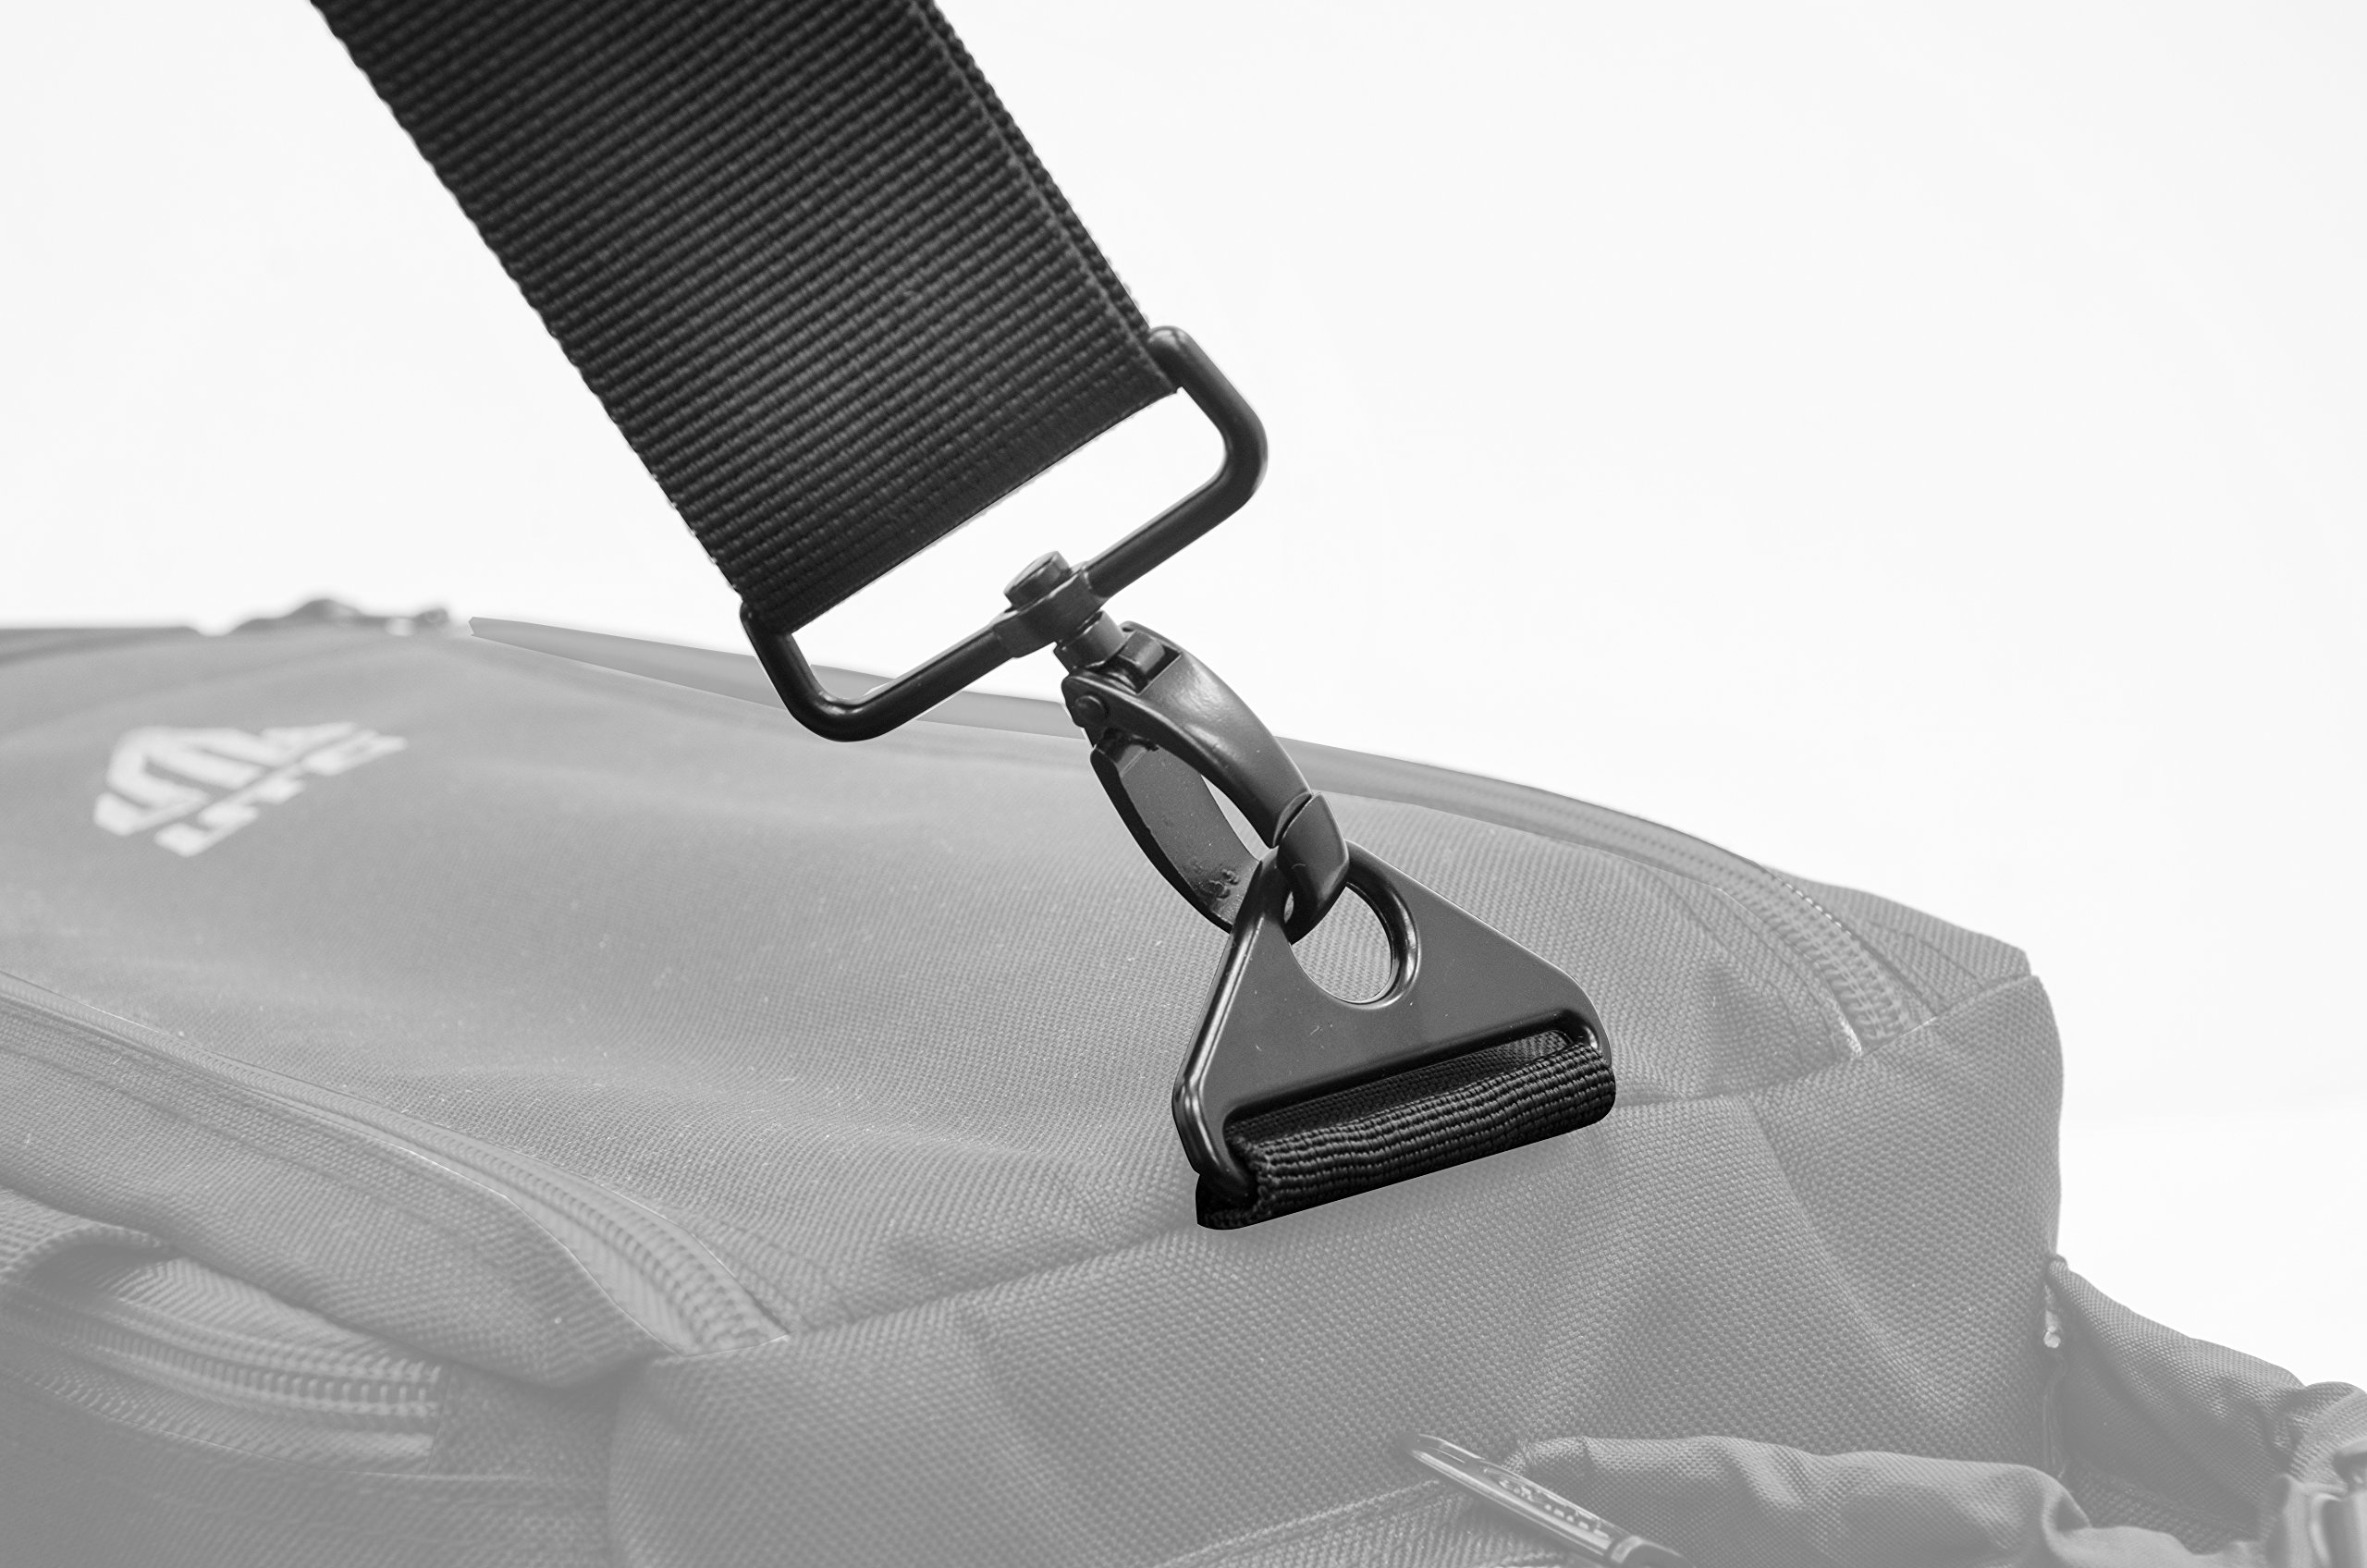 UTG All in One Range/Utility Go Bag, Black, 21'' x 10'' x 9'' by UTG (Image #11)